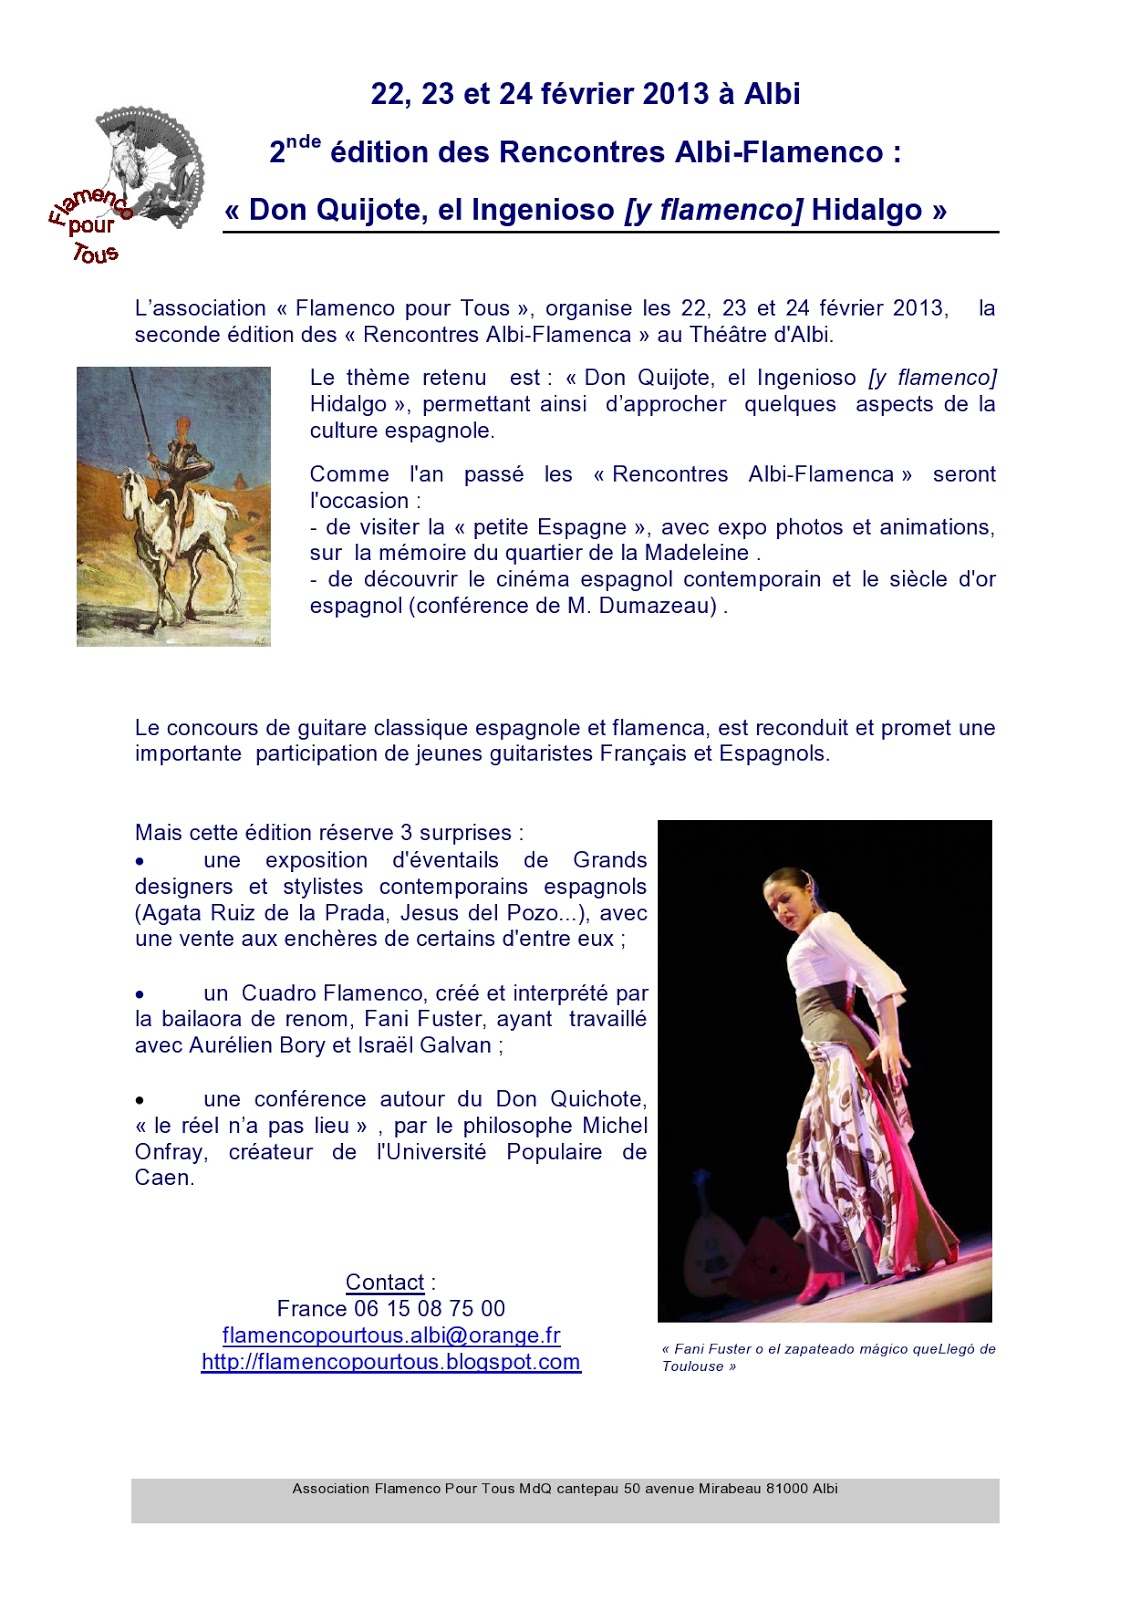 Rencontre albi flamenco